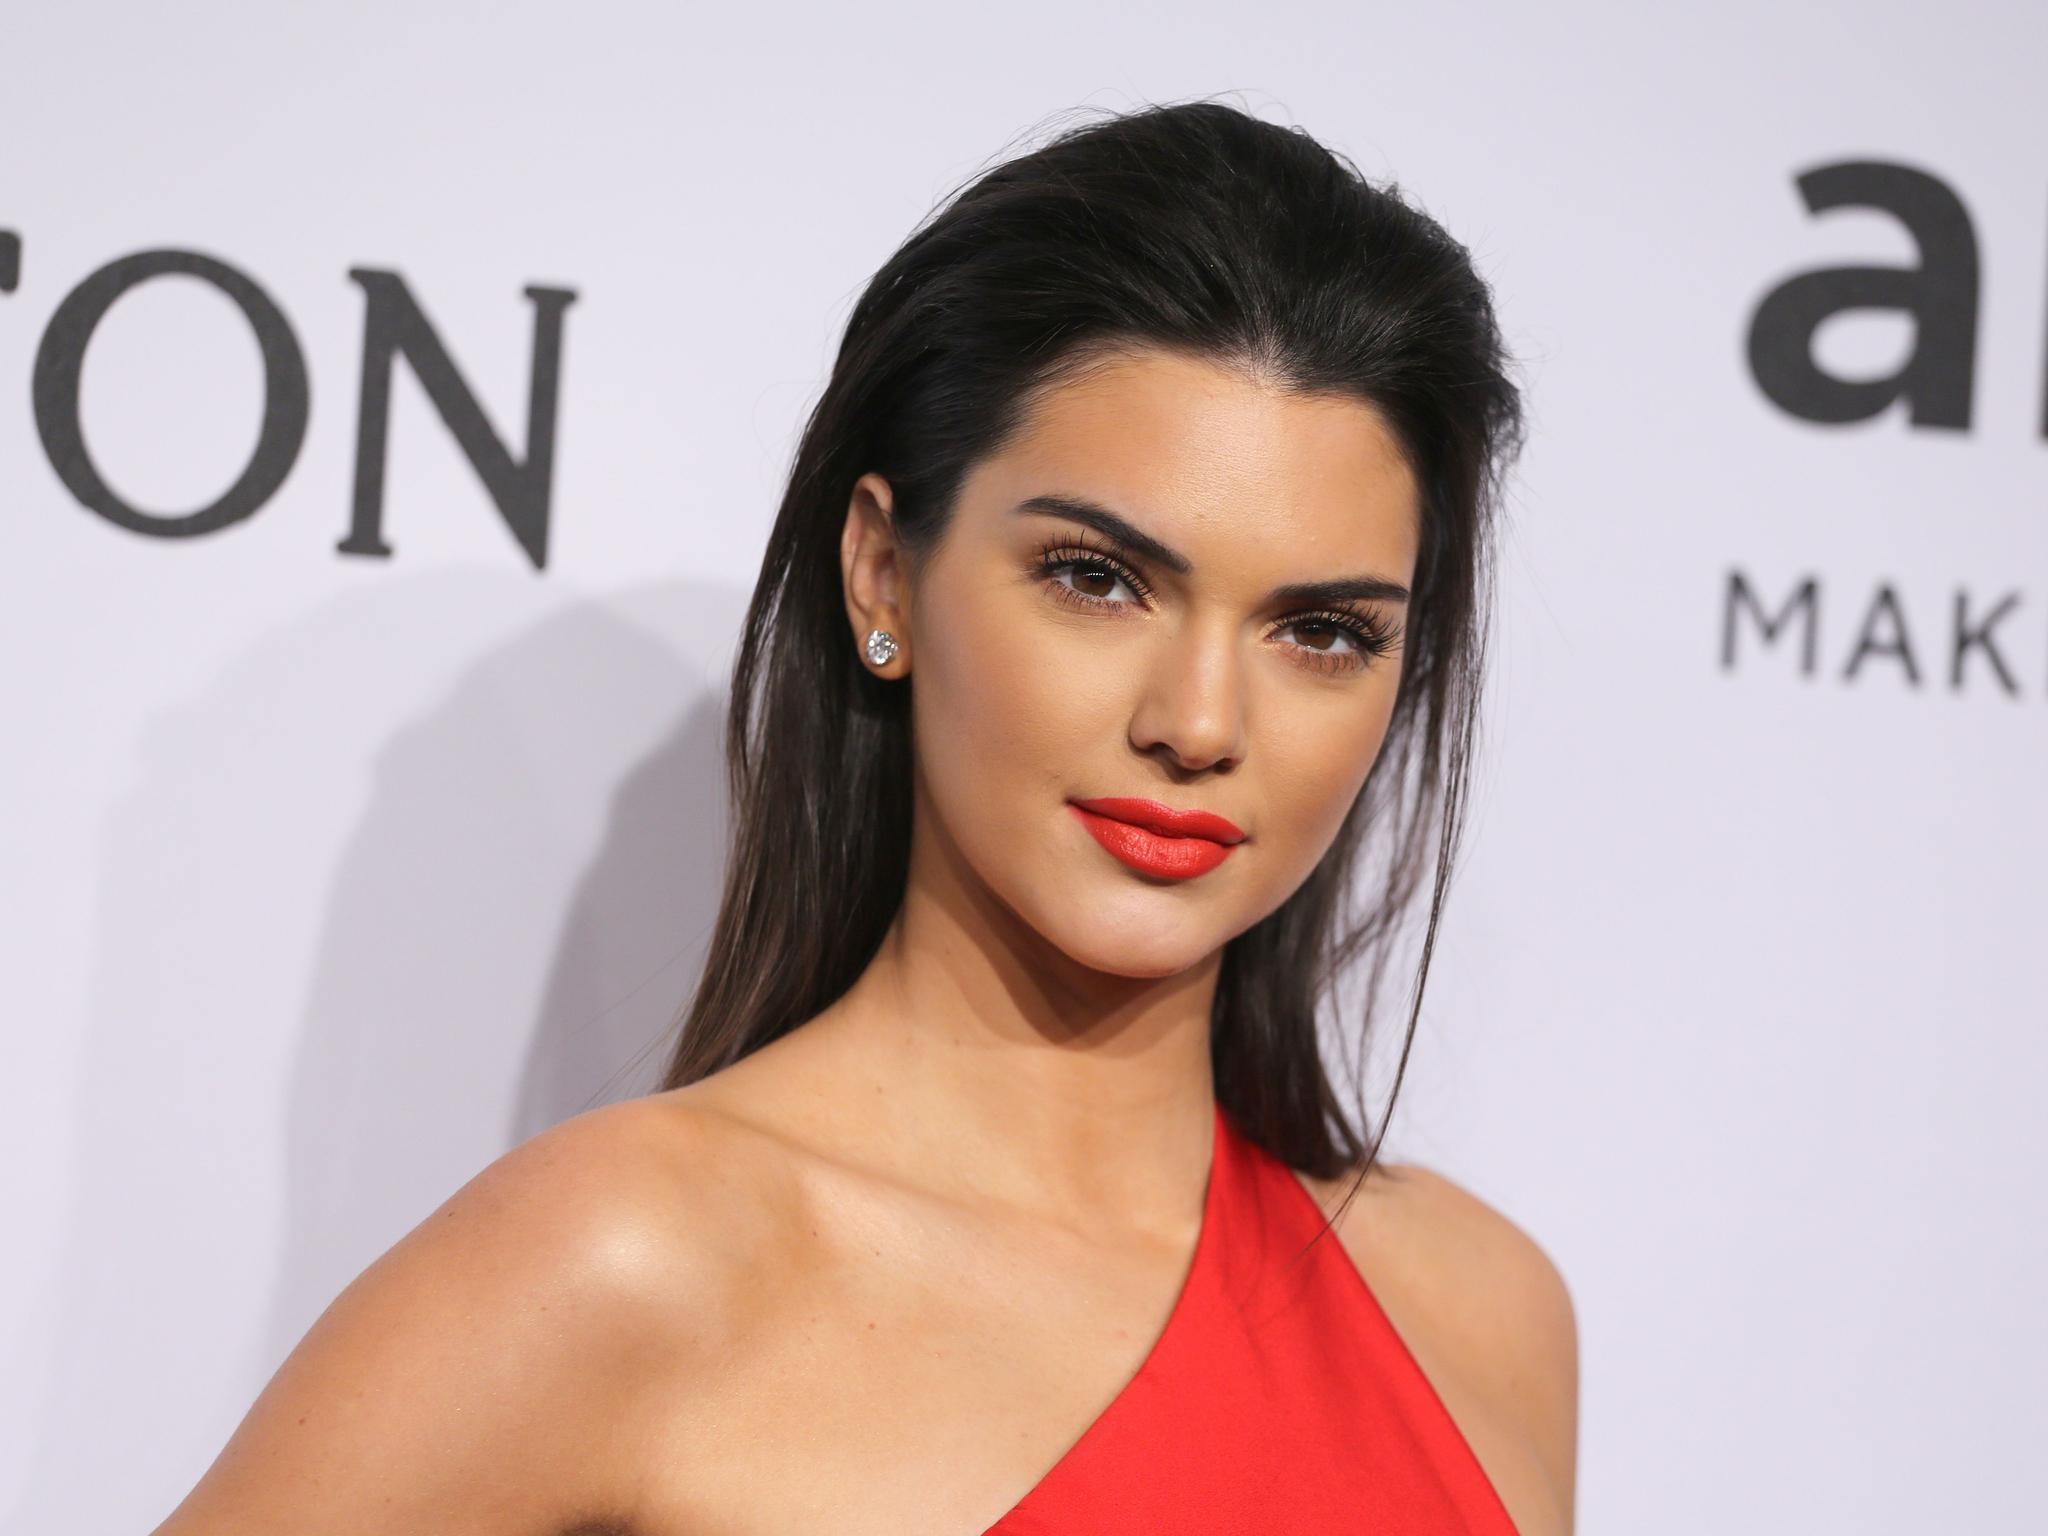 İşte Kendall Jenner'ın Beverly Hills'teki yeni evi!